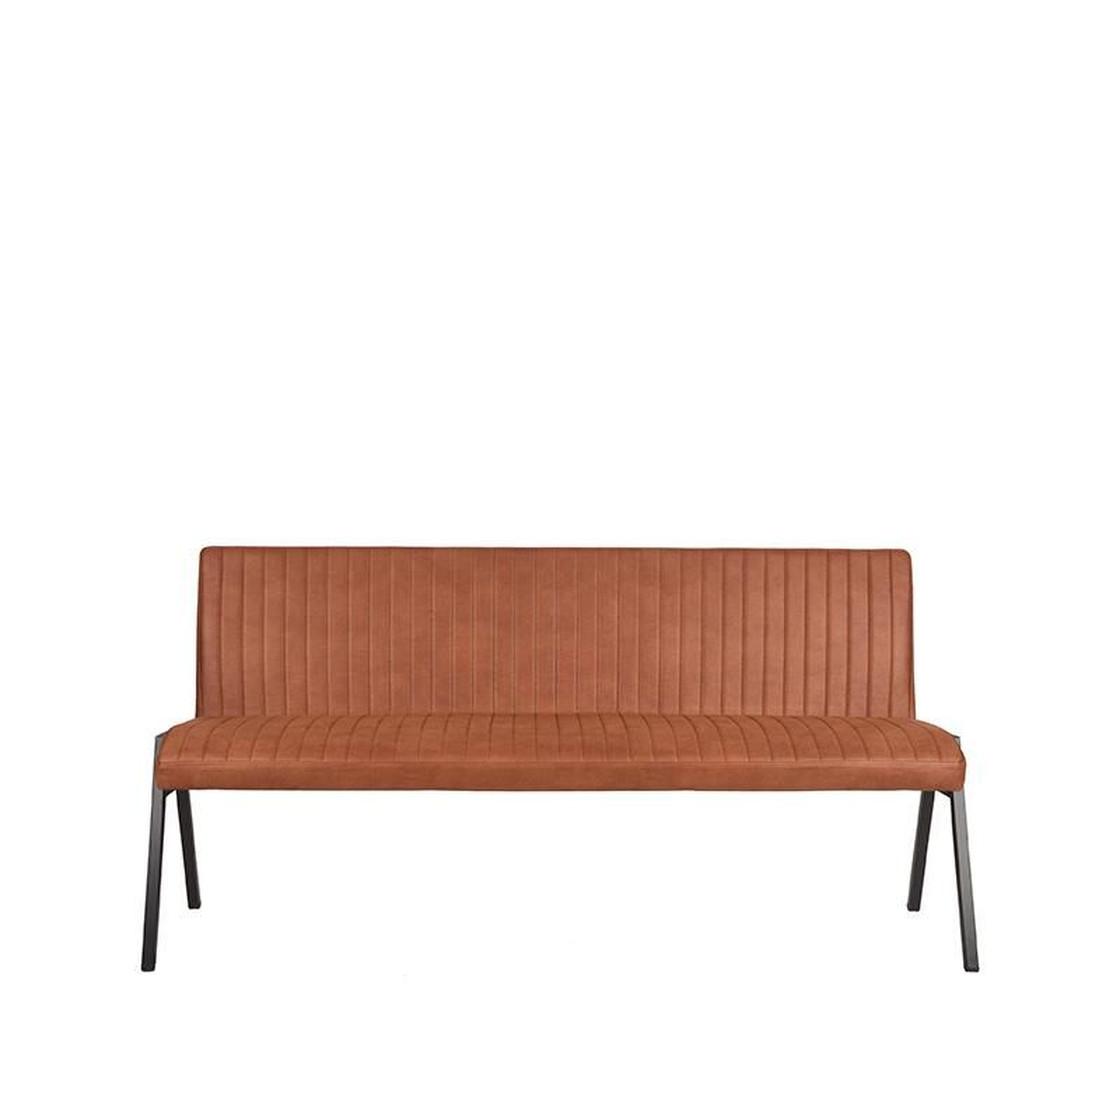 Full Size of Esszimmer Couch Ikea Sofa Landhausstil Vintage Sofabank Leder Grau Modern 3 Sitzer Matz B 175 Cm T 62 H 86 Massivholzbetten W Chesterfield Großes Mit Sofa Esszimmer Sofa